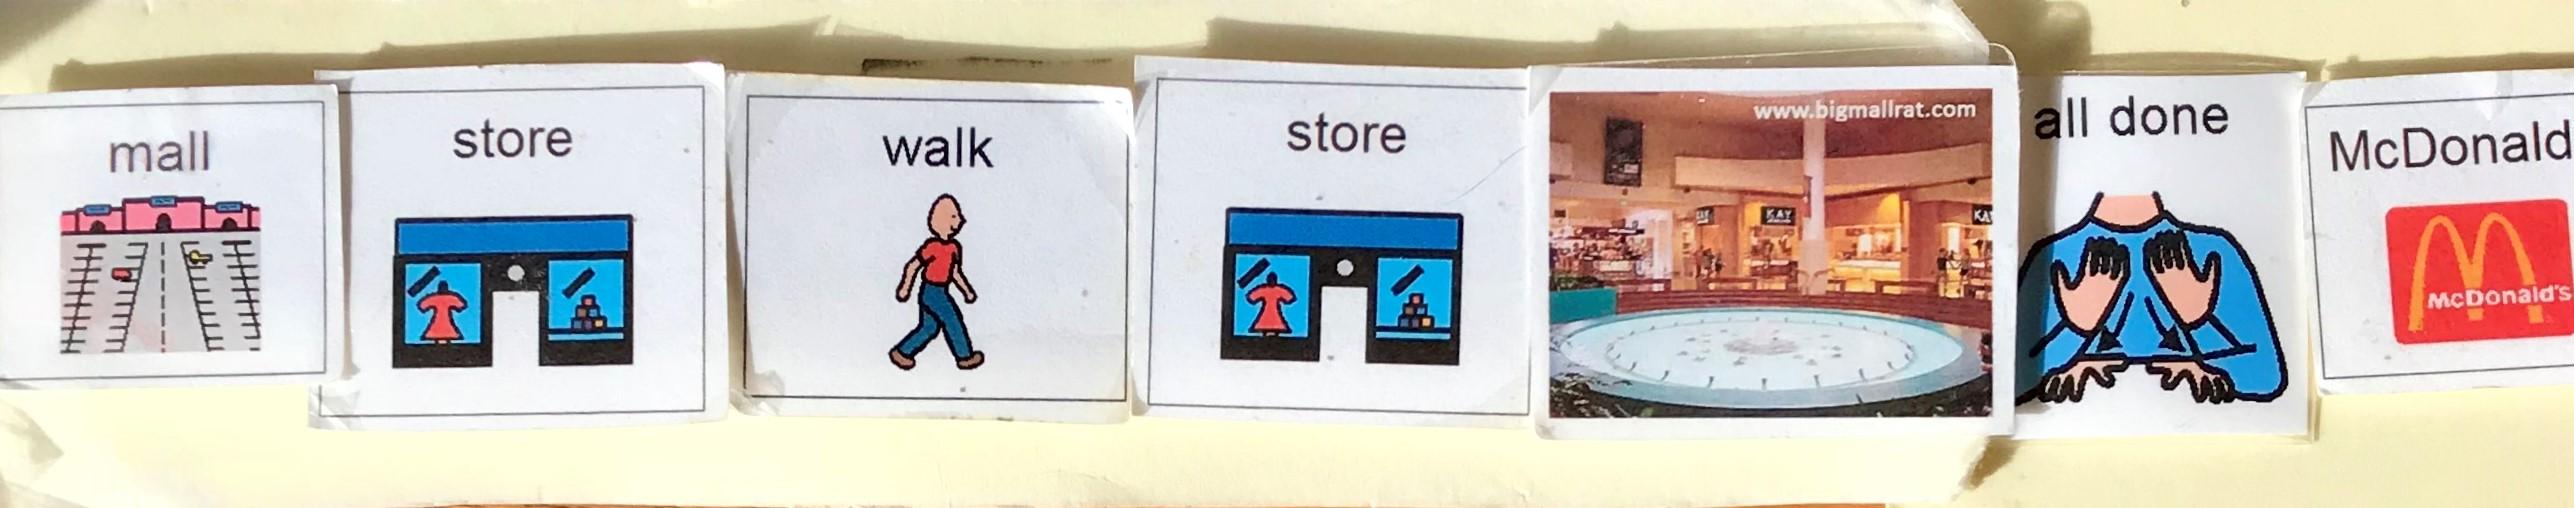 task strip mall